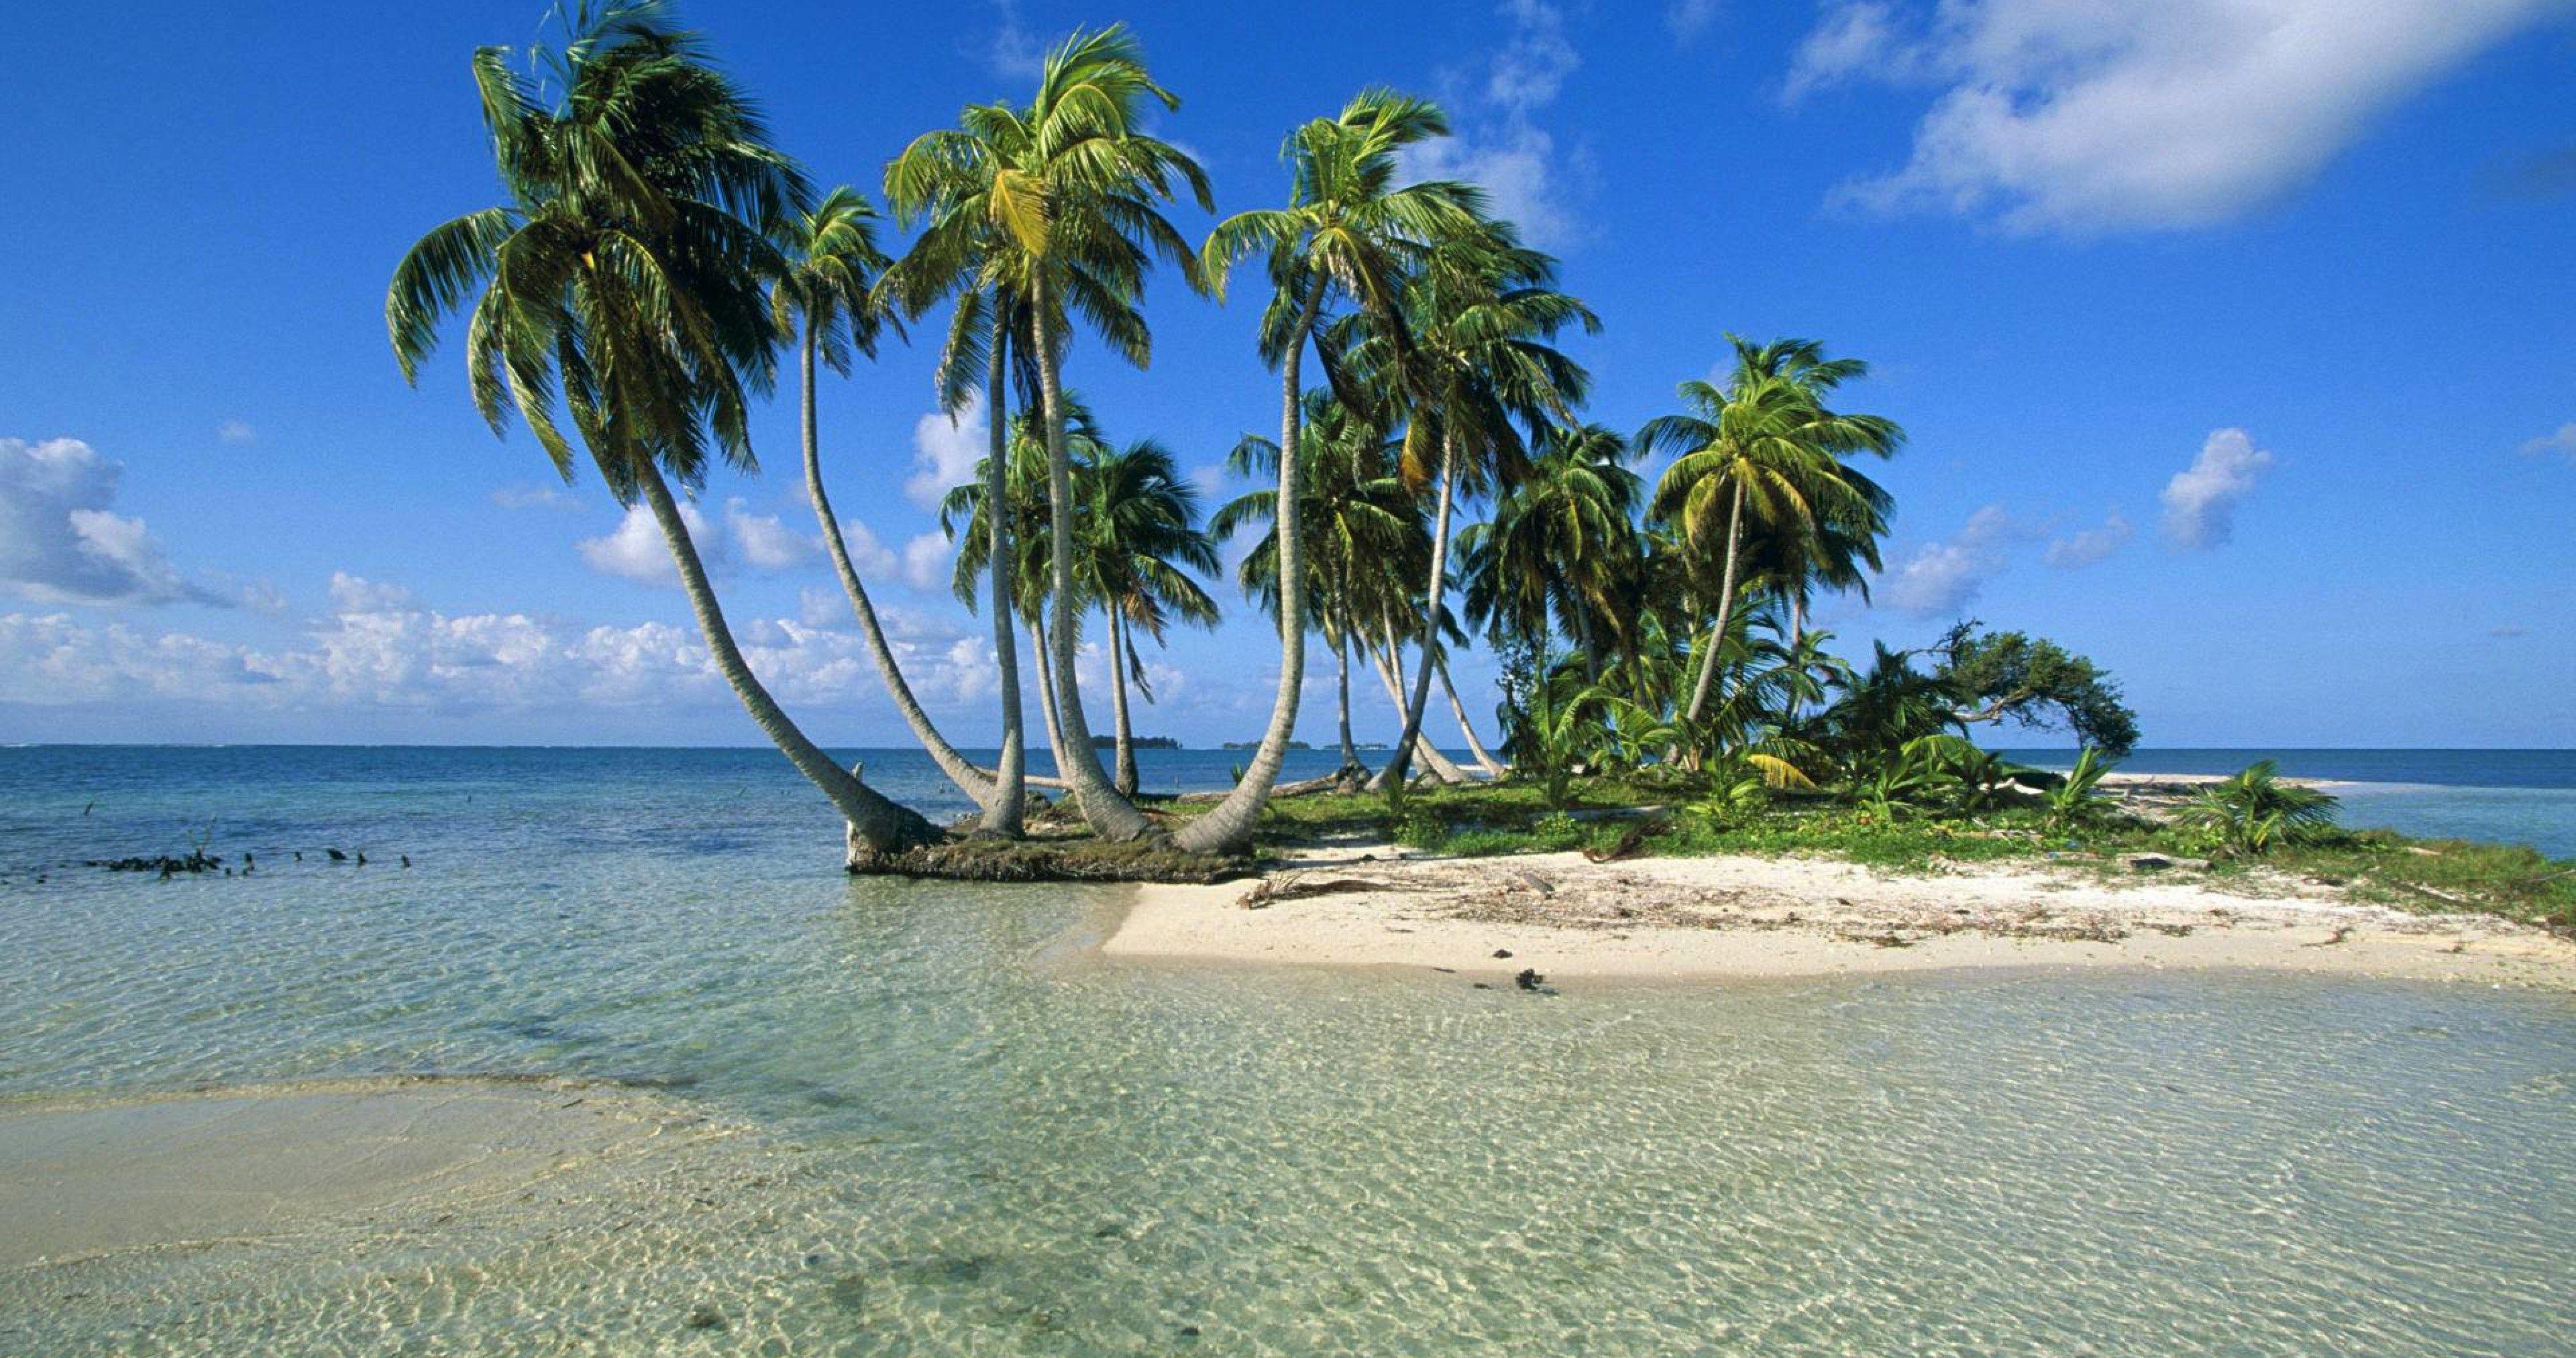 Island Palm Trees 4k Ultra Hd Wallpaper Nature Beach Palm Trees